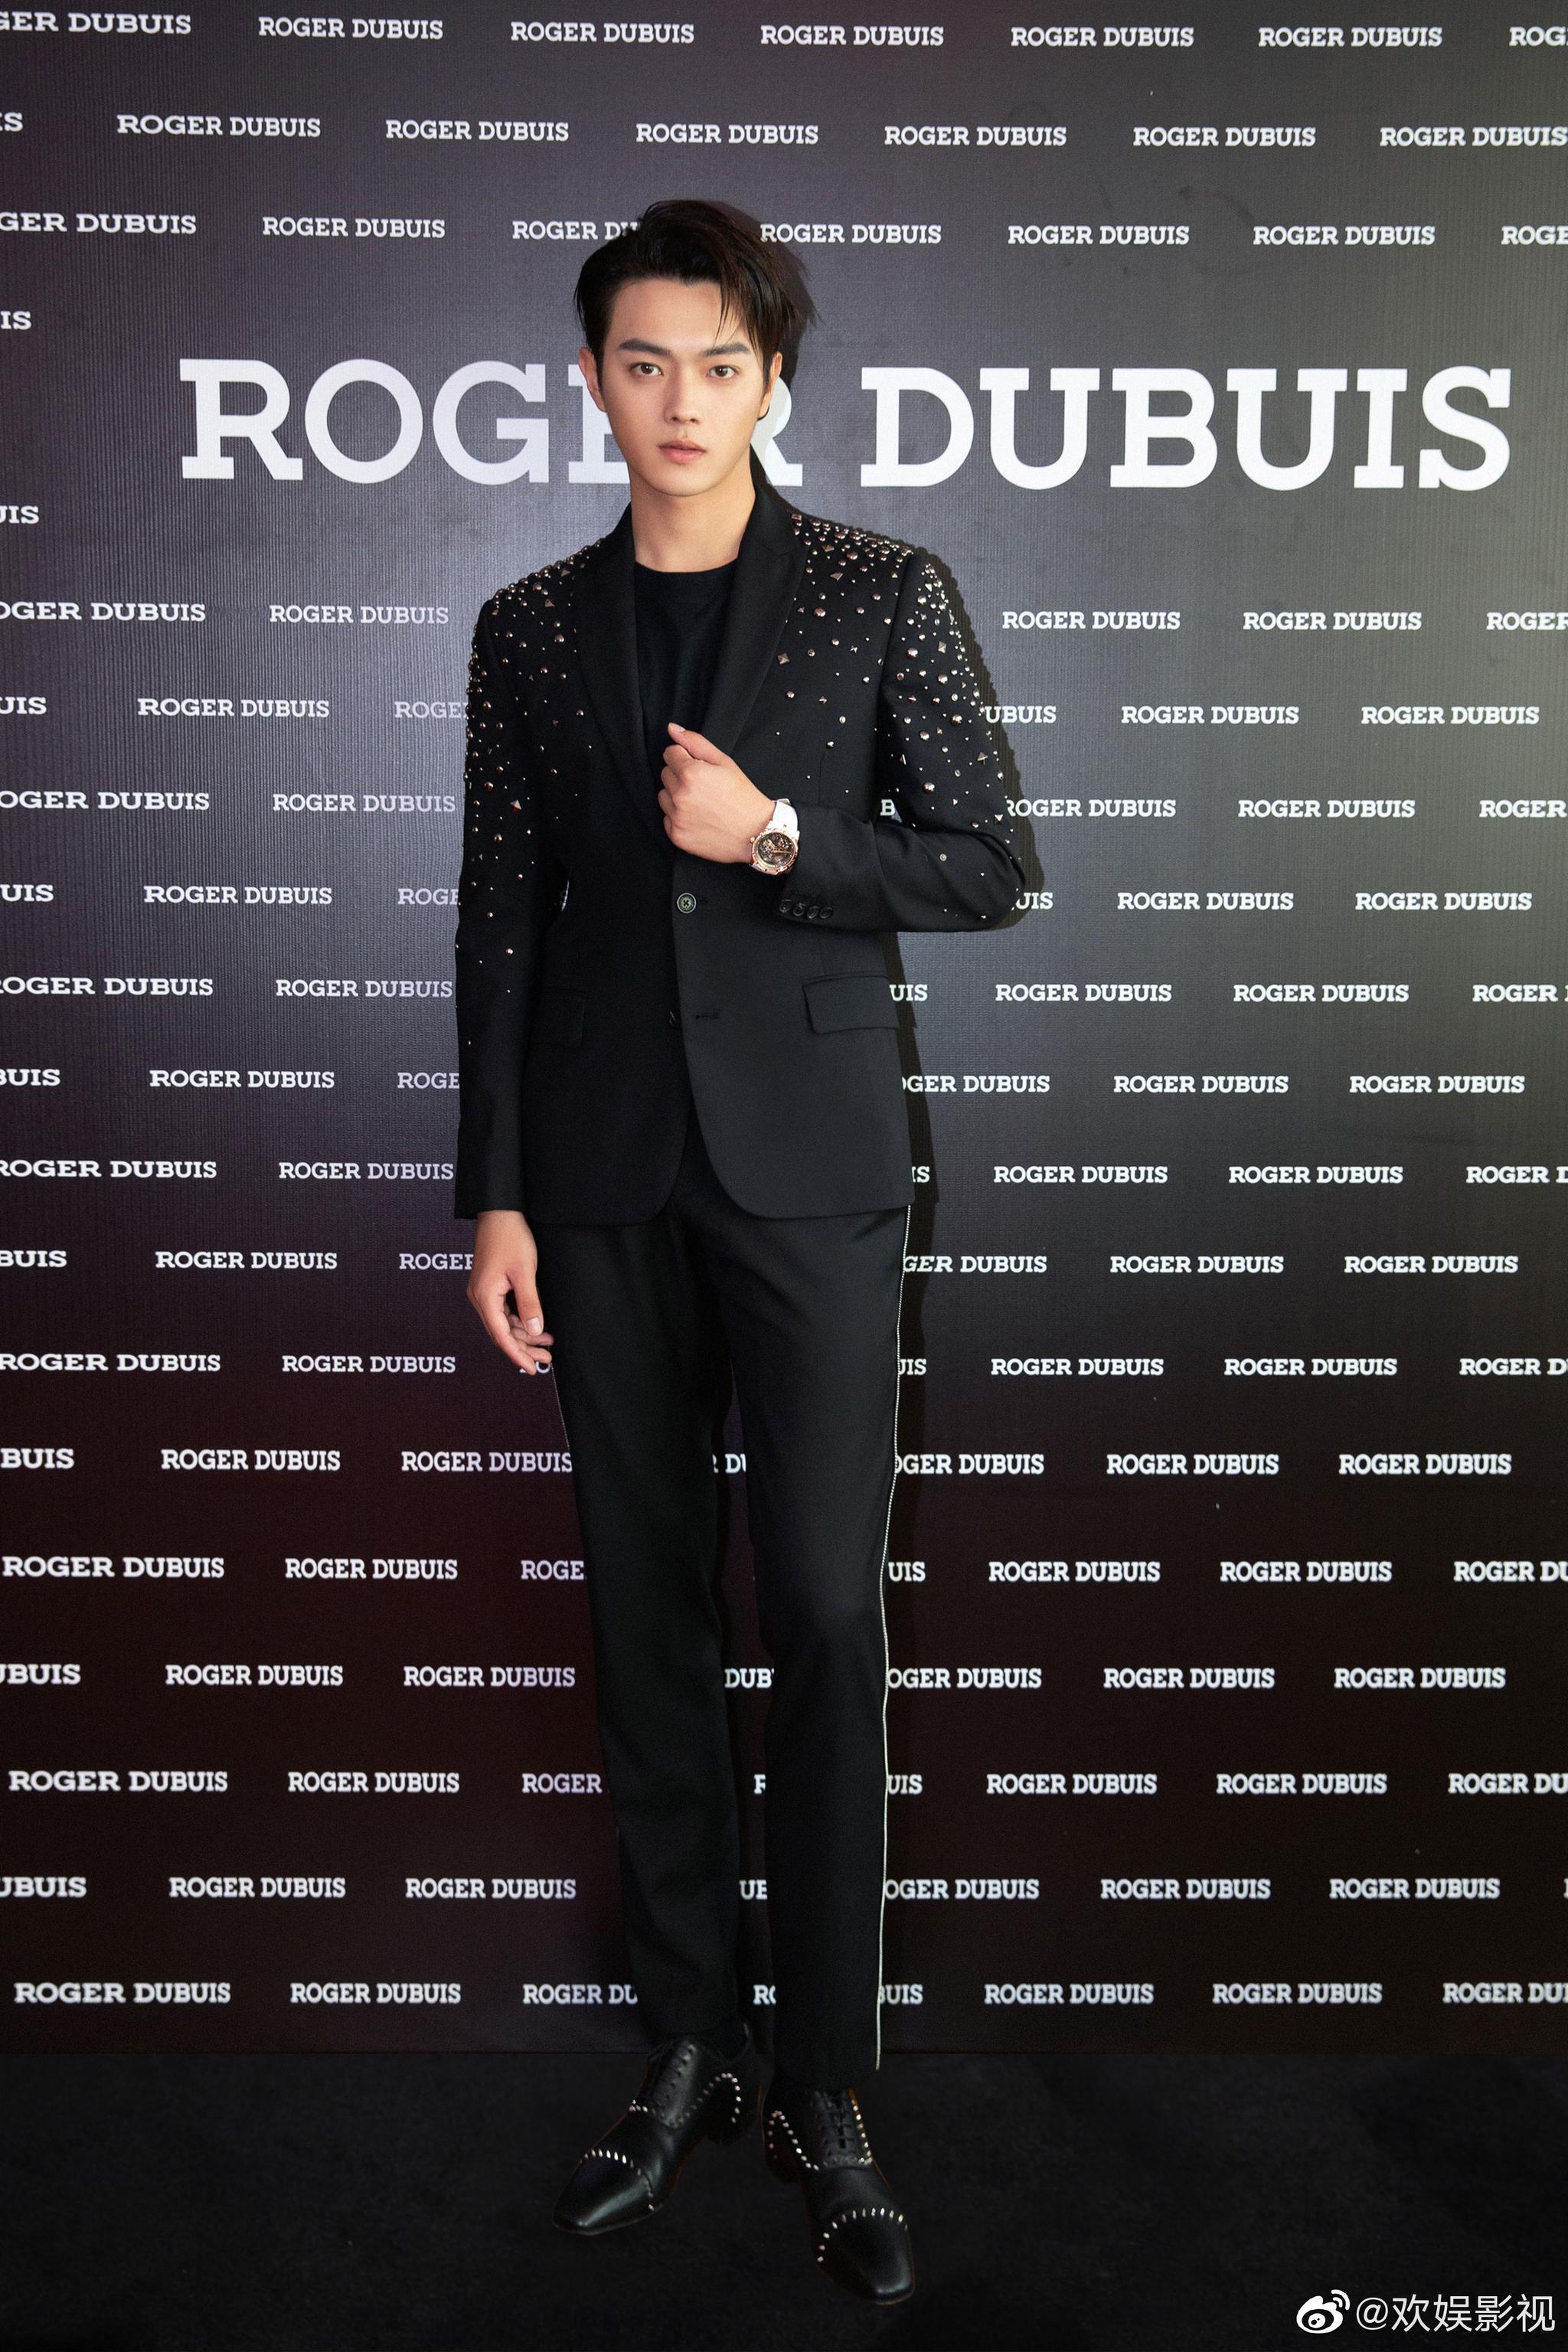 欢娱影视演员@许凯soso 出席roger dubuis罗杰杜彼品牌活动